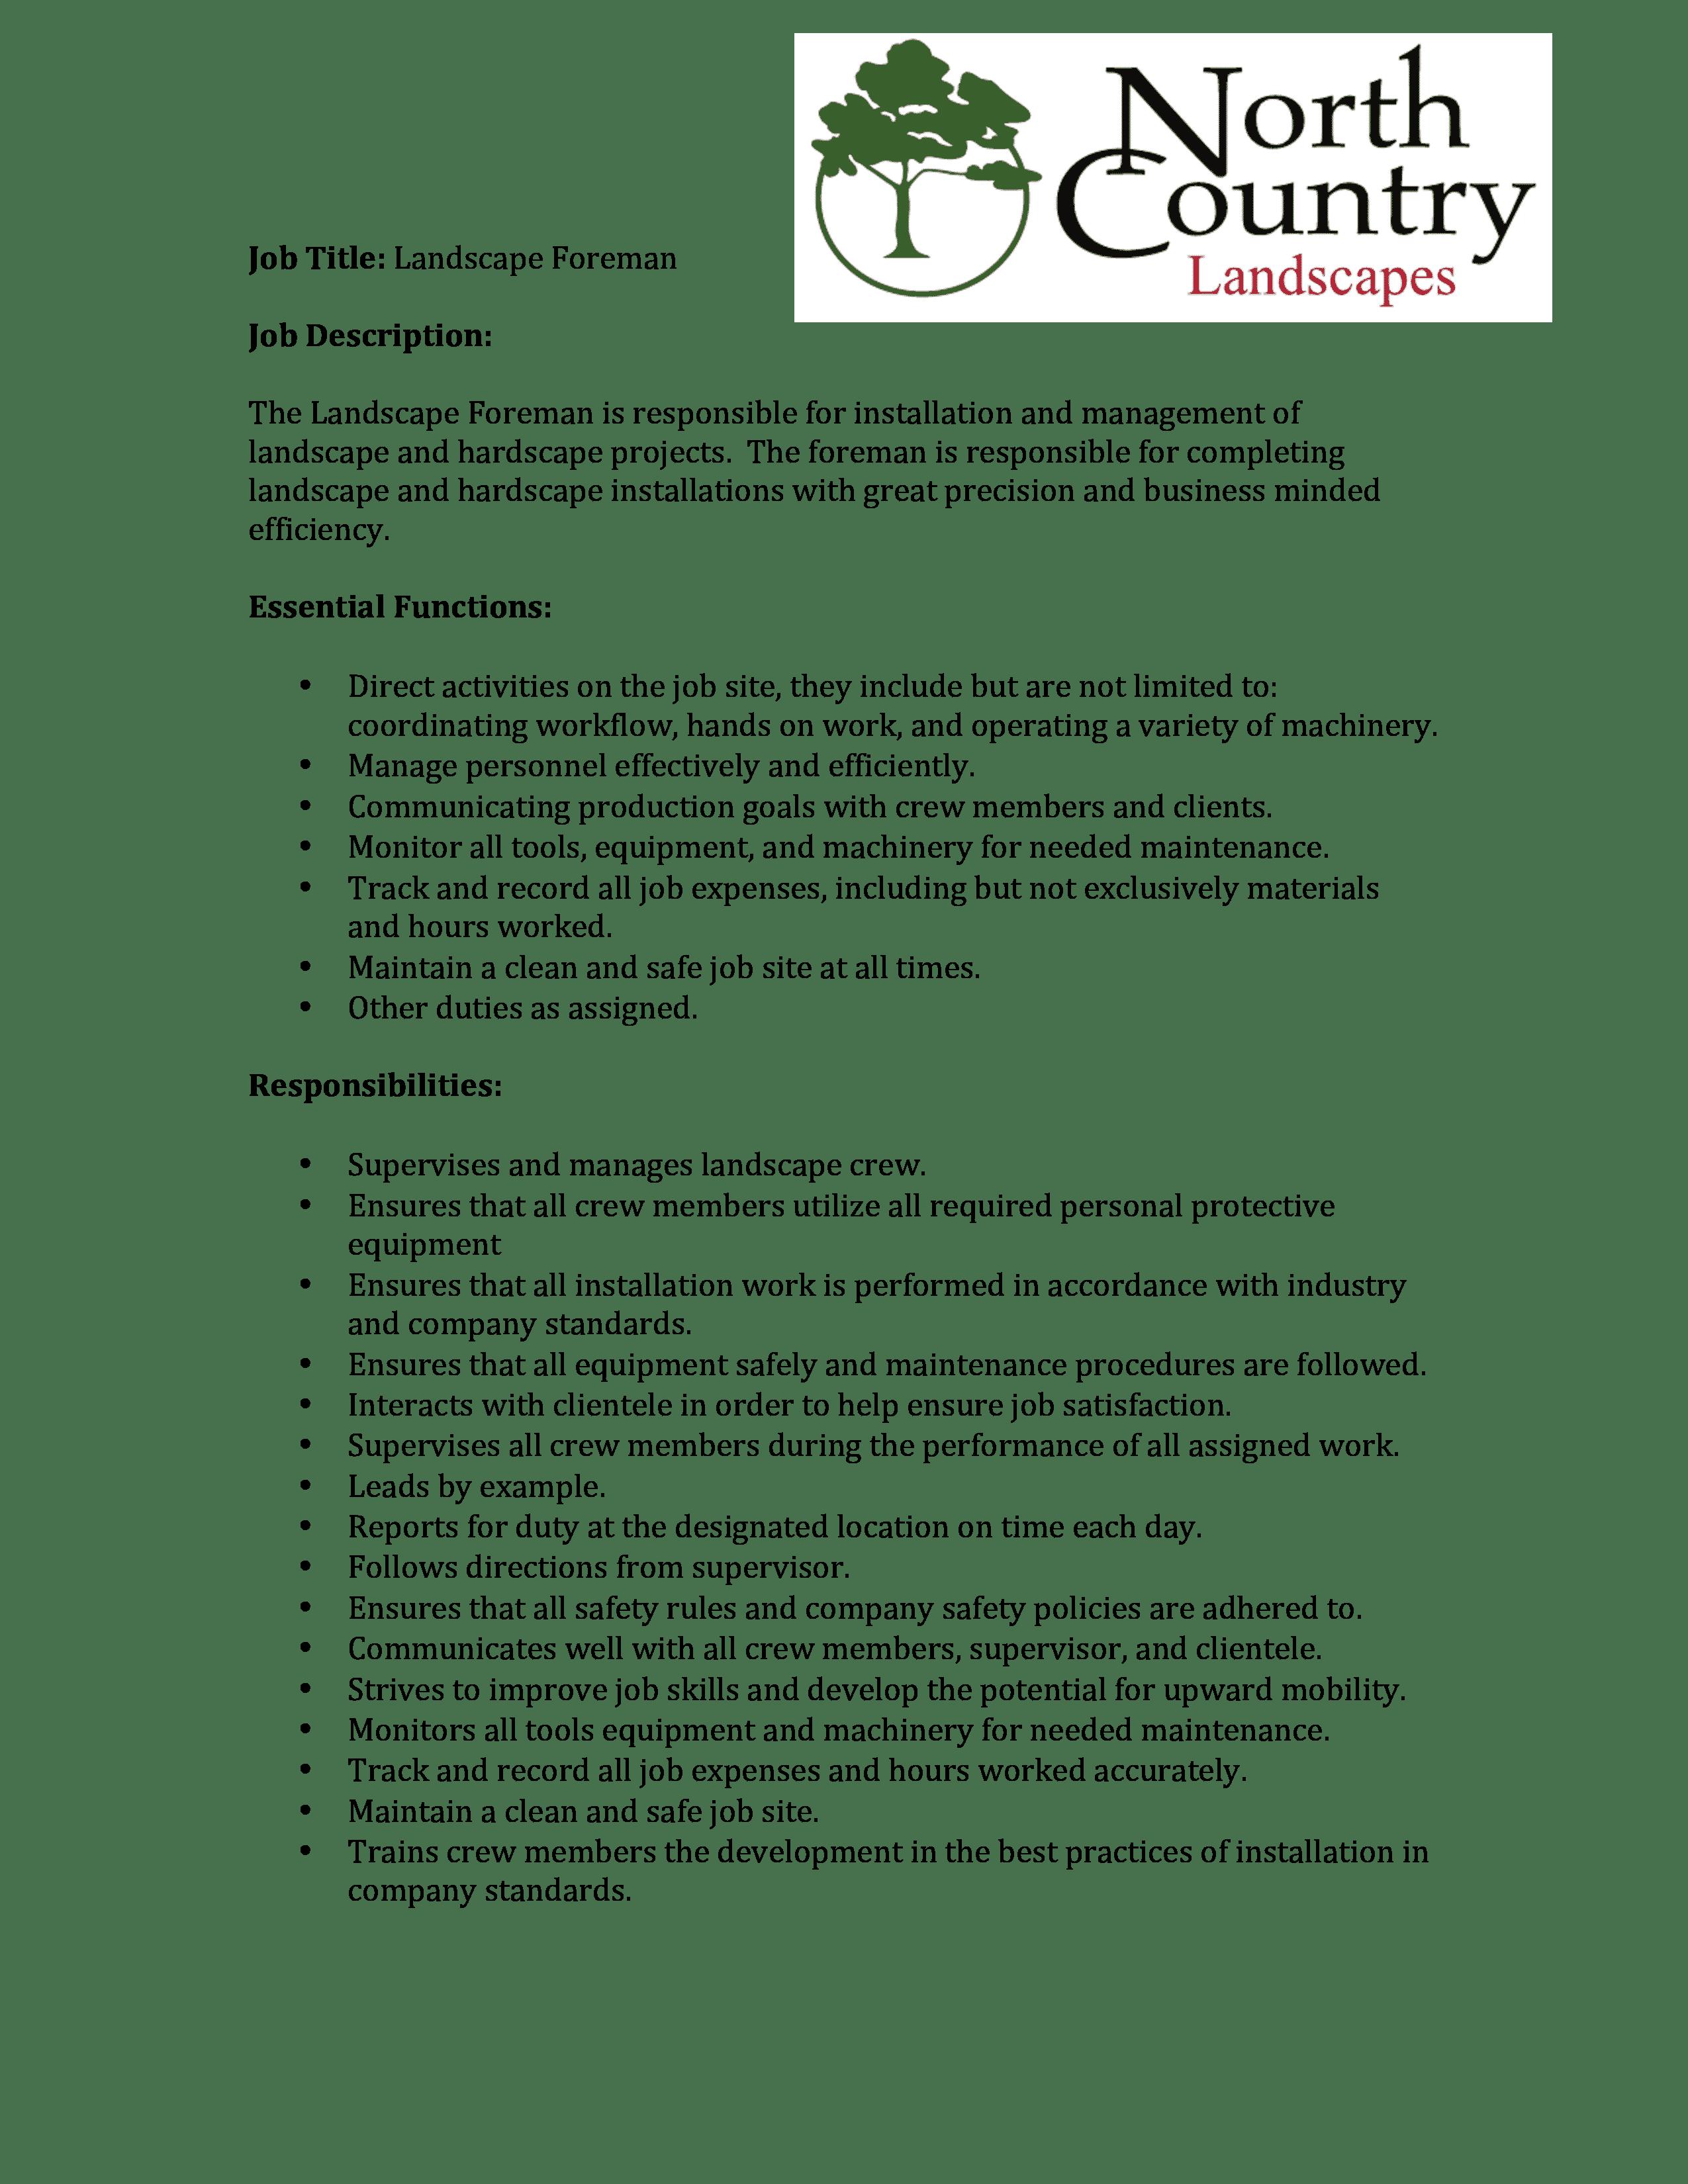 landscape-foreman-job-responsibilities